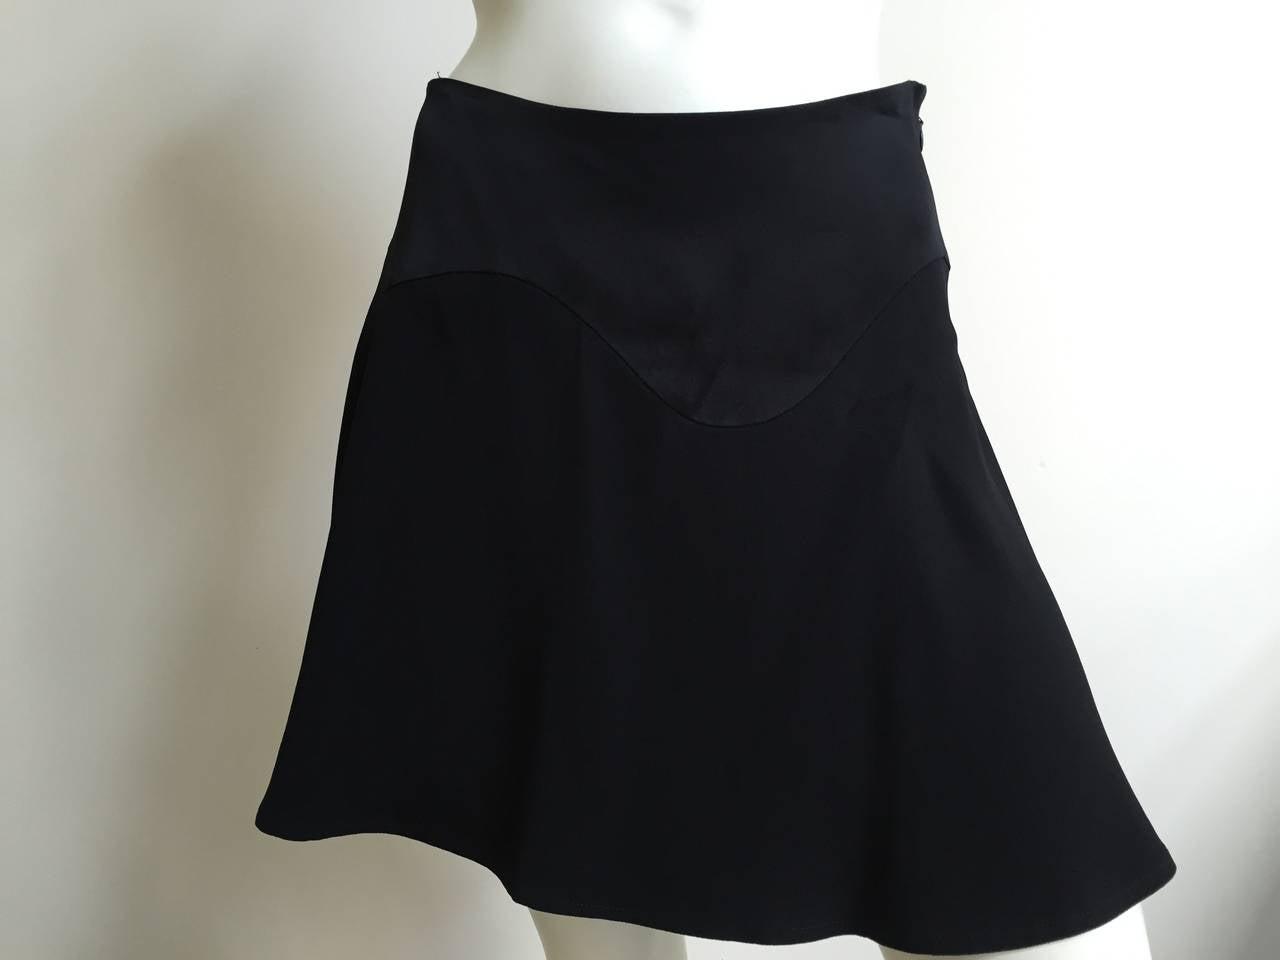 Moschino Black Short Skirt Size 6. 3